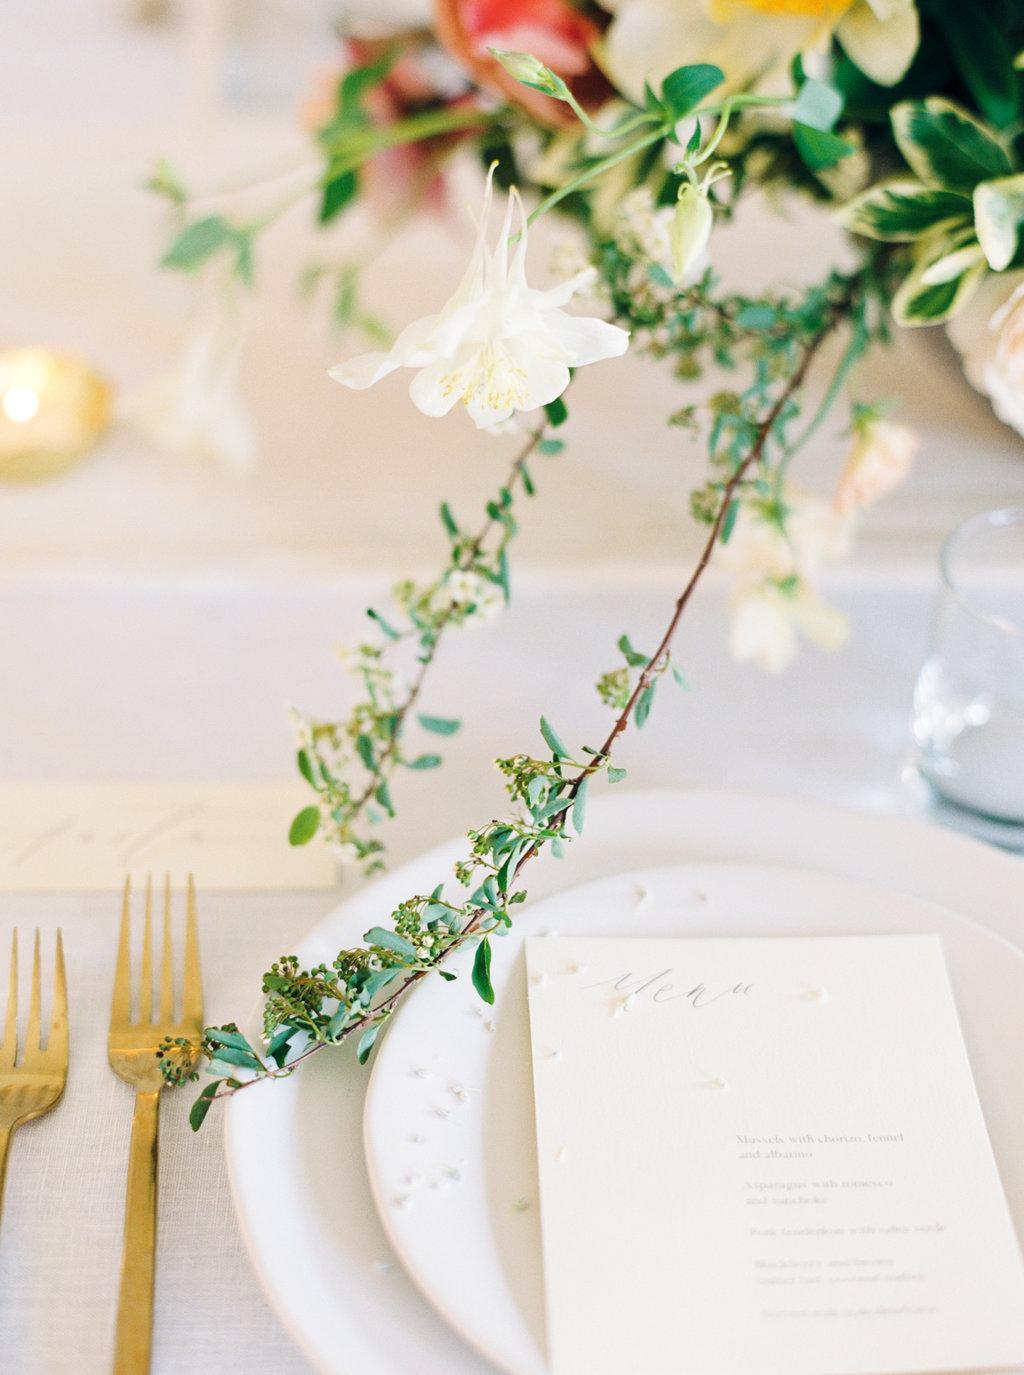 Kelsea_Holder_Photography_Rava_Wines_Bloom_Floral_and_Foliage_5.jpg